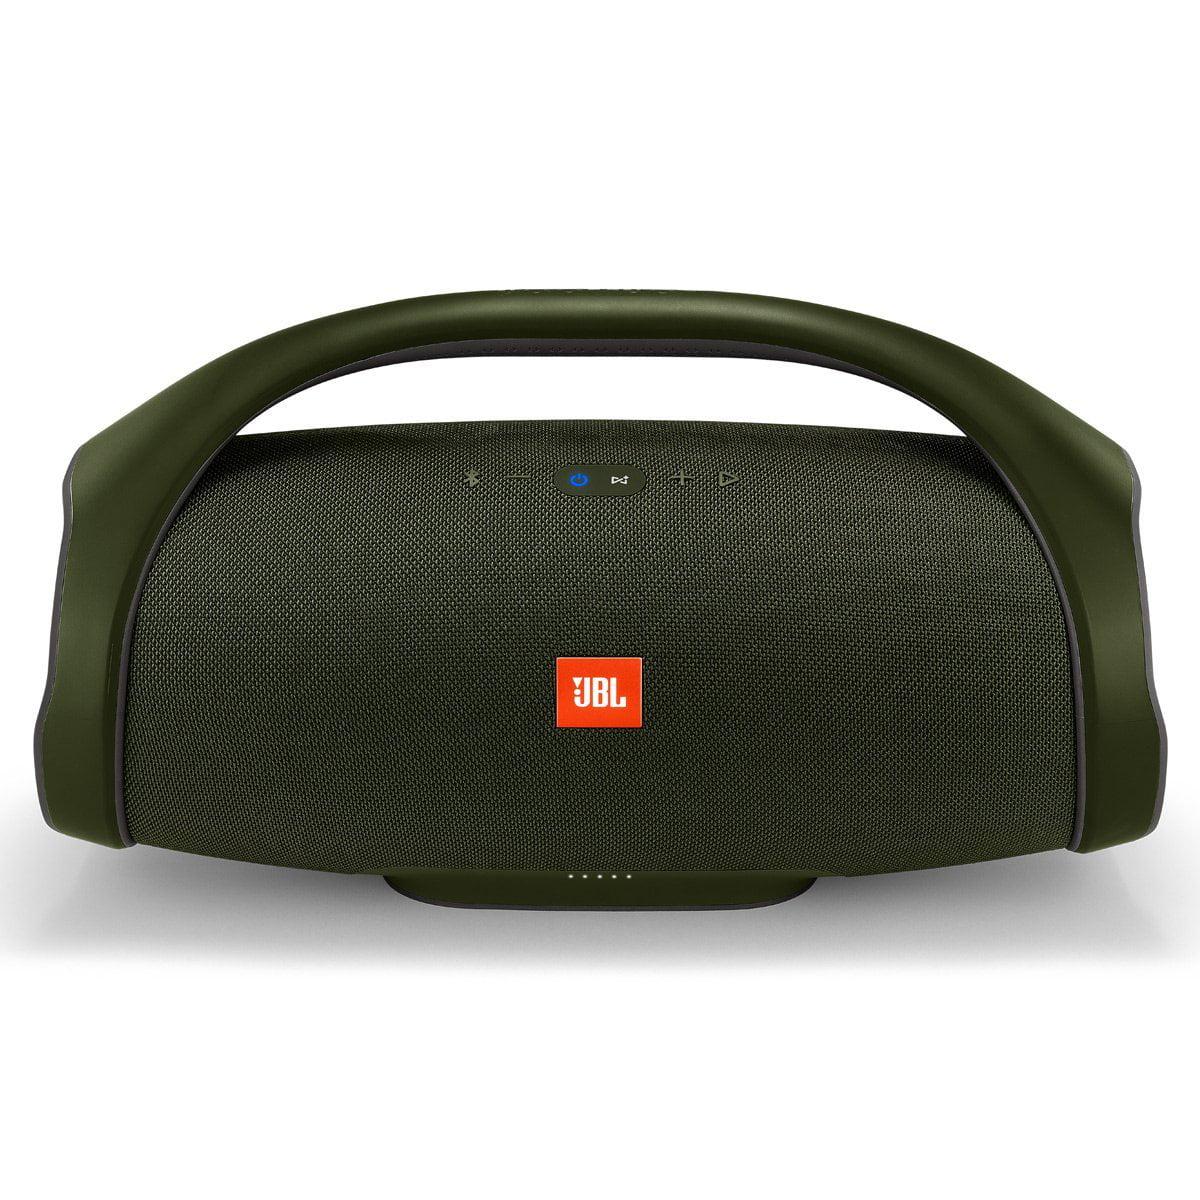 JBL Boombox Portable Bluetooth Waterproof Speaker